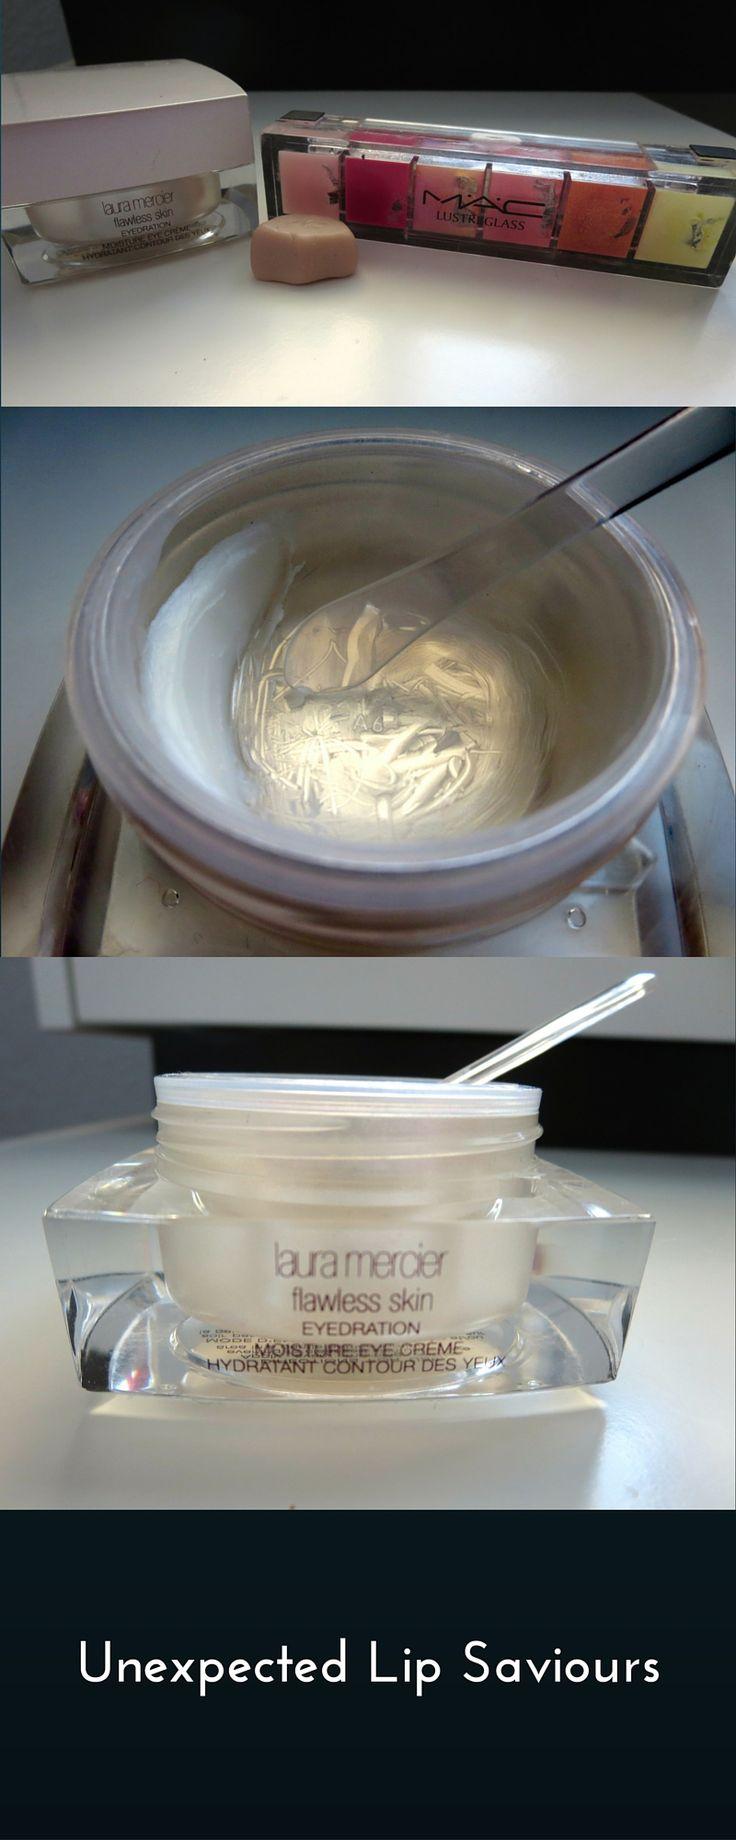 Best overnight lip treatment: Laura Mercier Flawless Skin Eyedration moisture eye cream